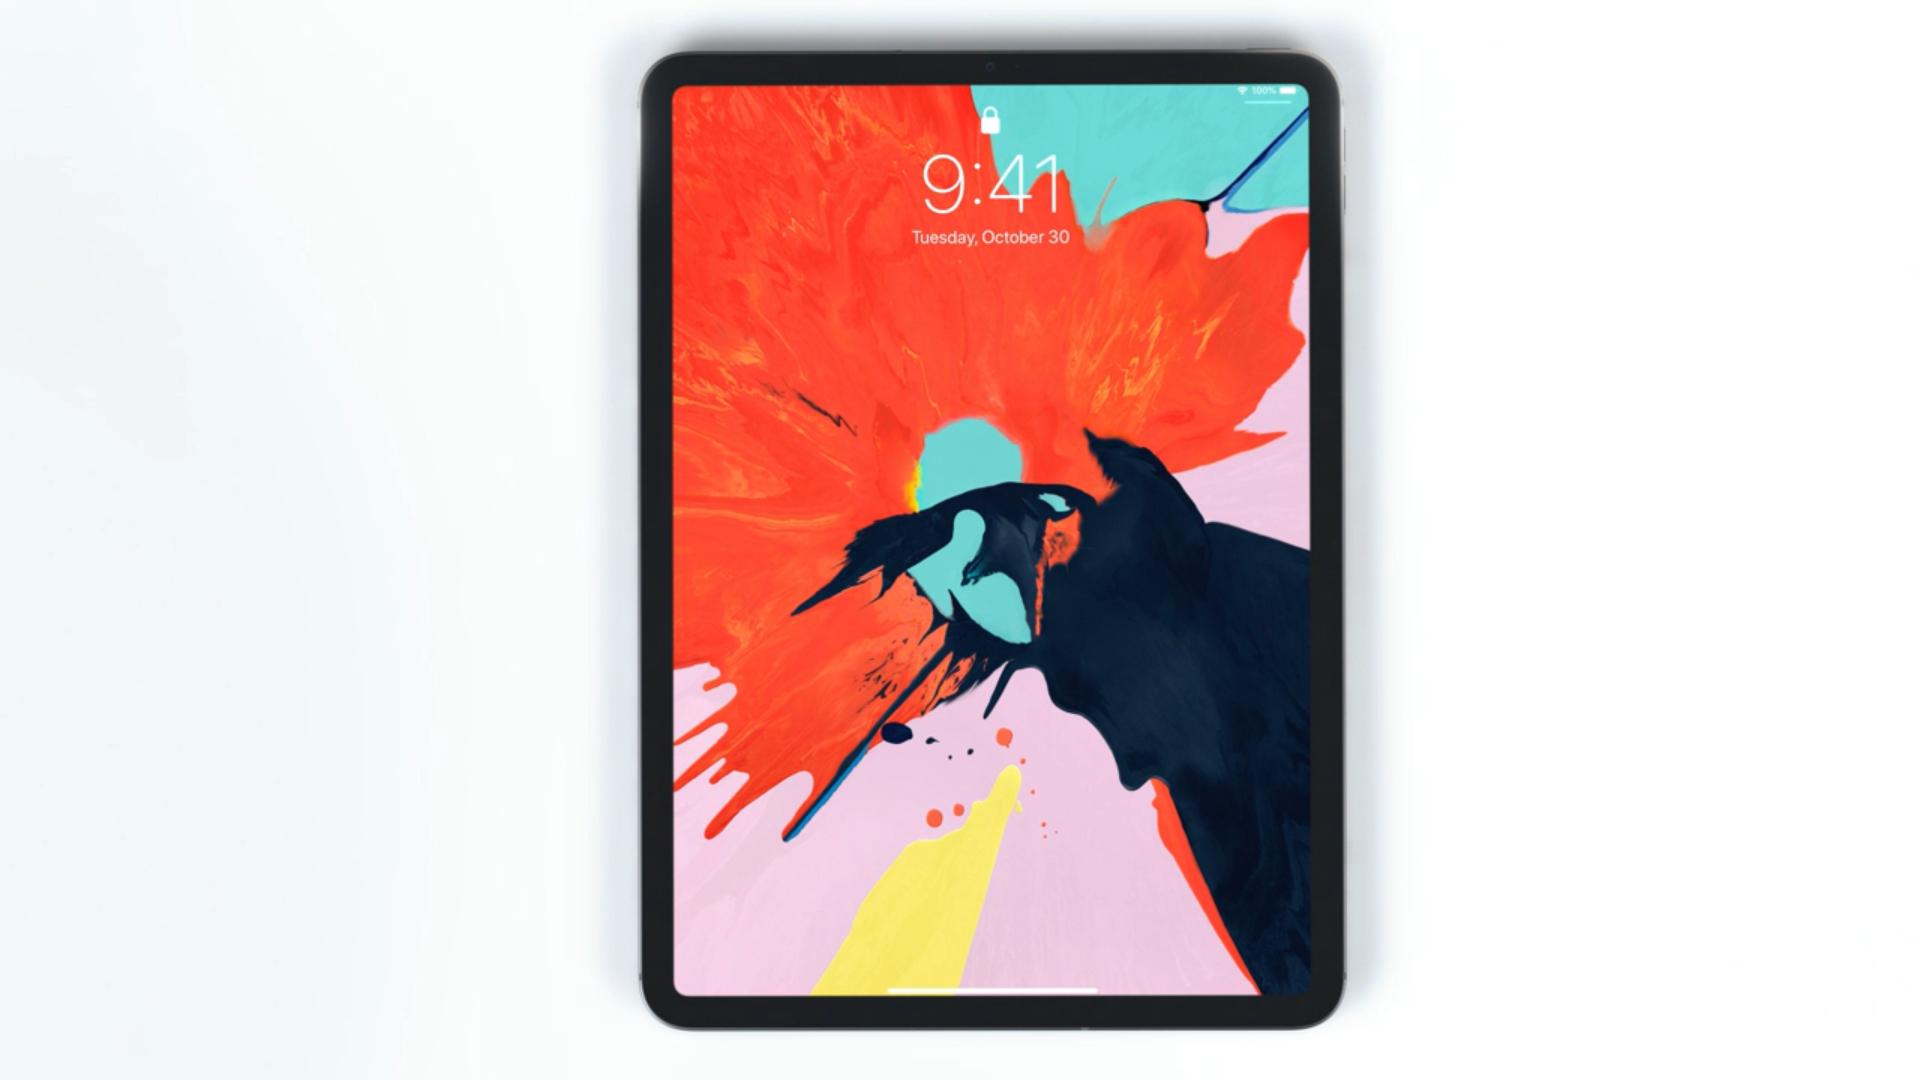 možete li spojiti mac mini na macbook pro datiranje hutchinson mn